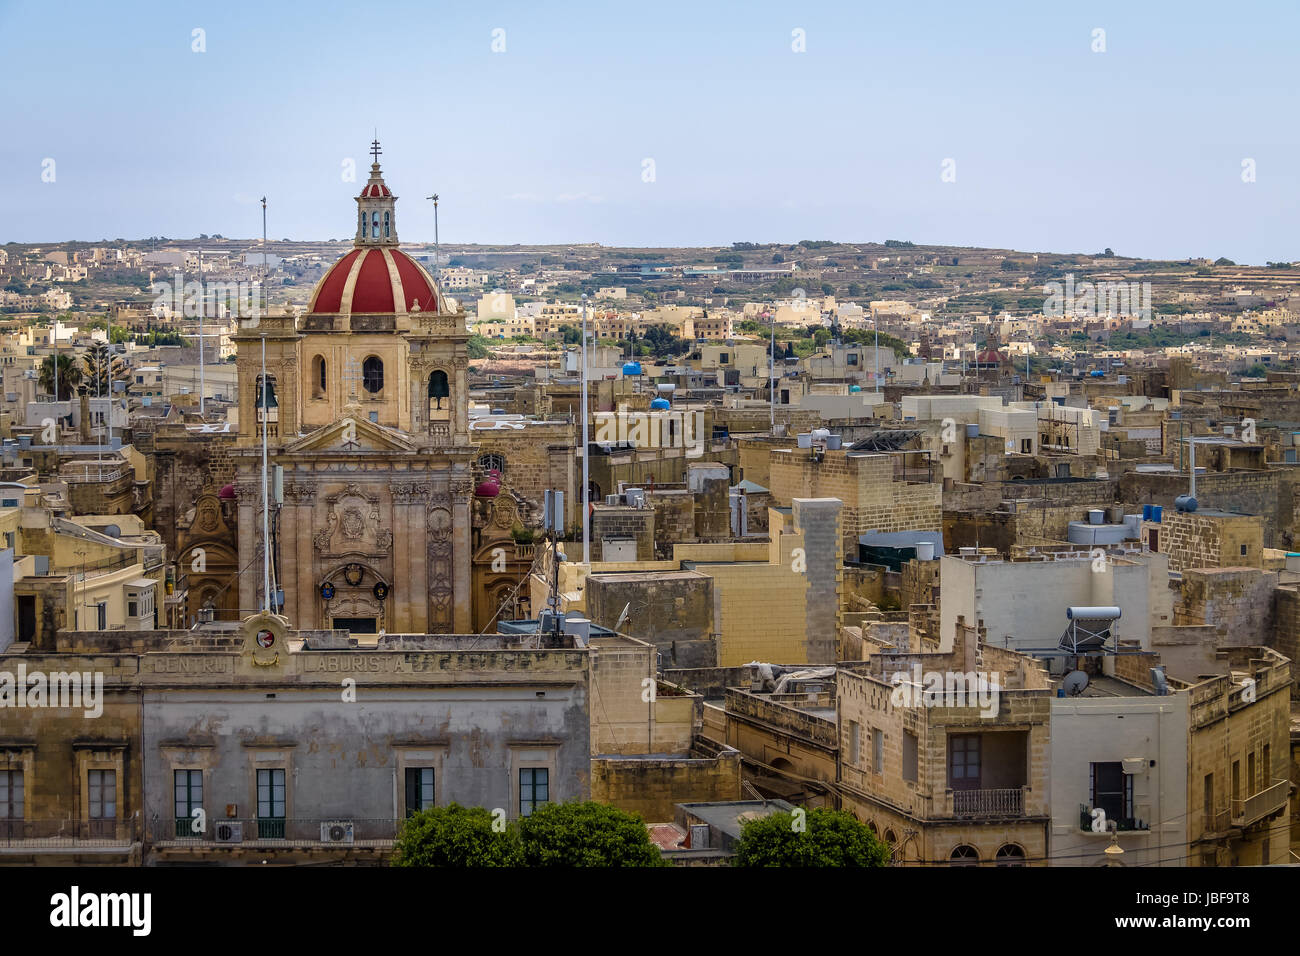 Victoria city with Saint George Basilica view from the citadel - Victoria, Gozo, Malta - Stock Image